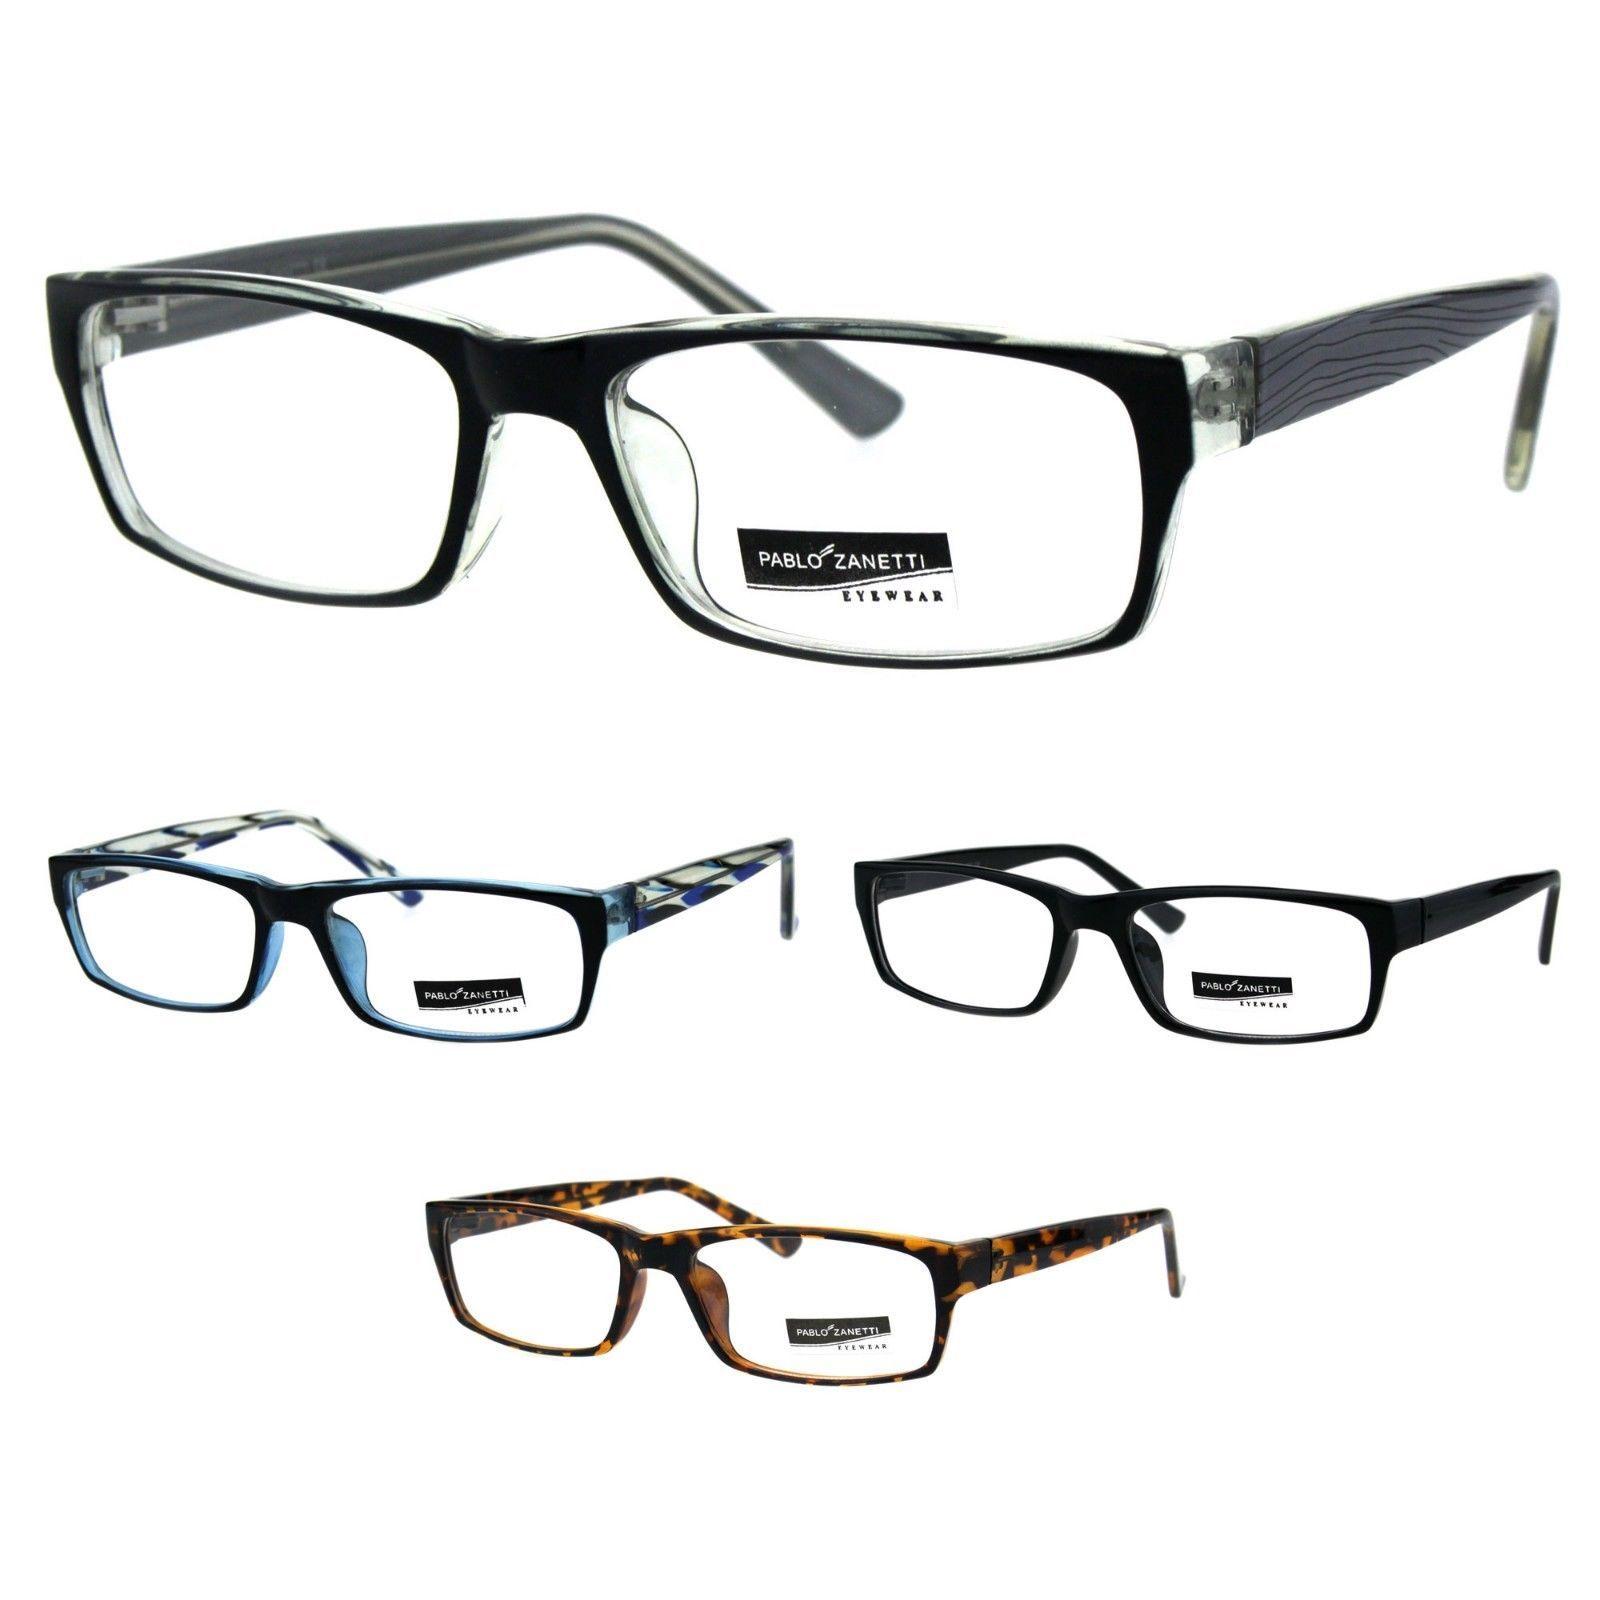 e975b735aa 57. 57. Classic Narrow Rectangular Professor Studious Plastic Eyeglasses  Frame